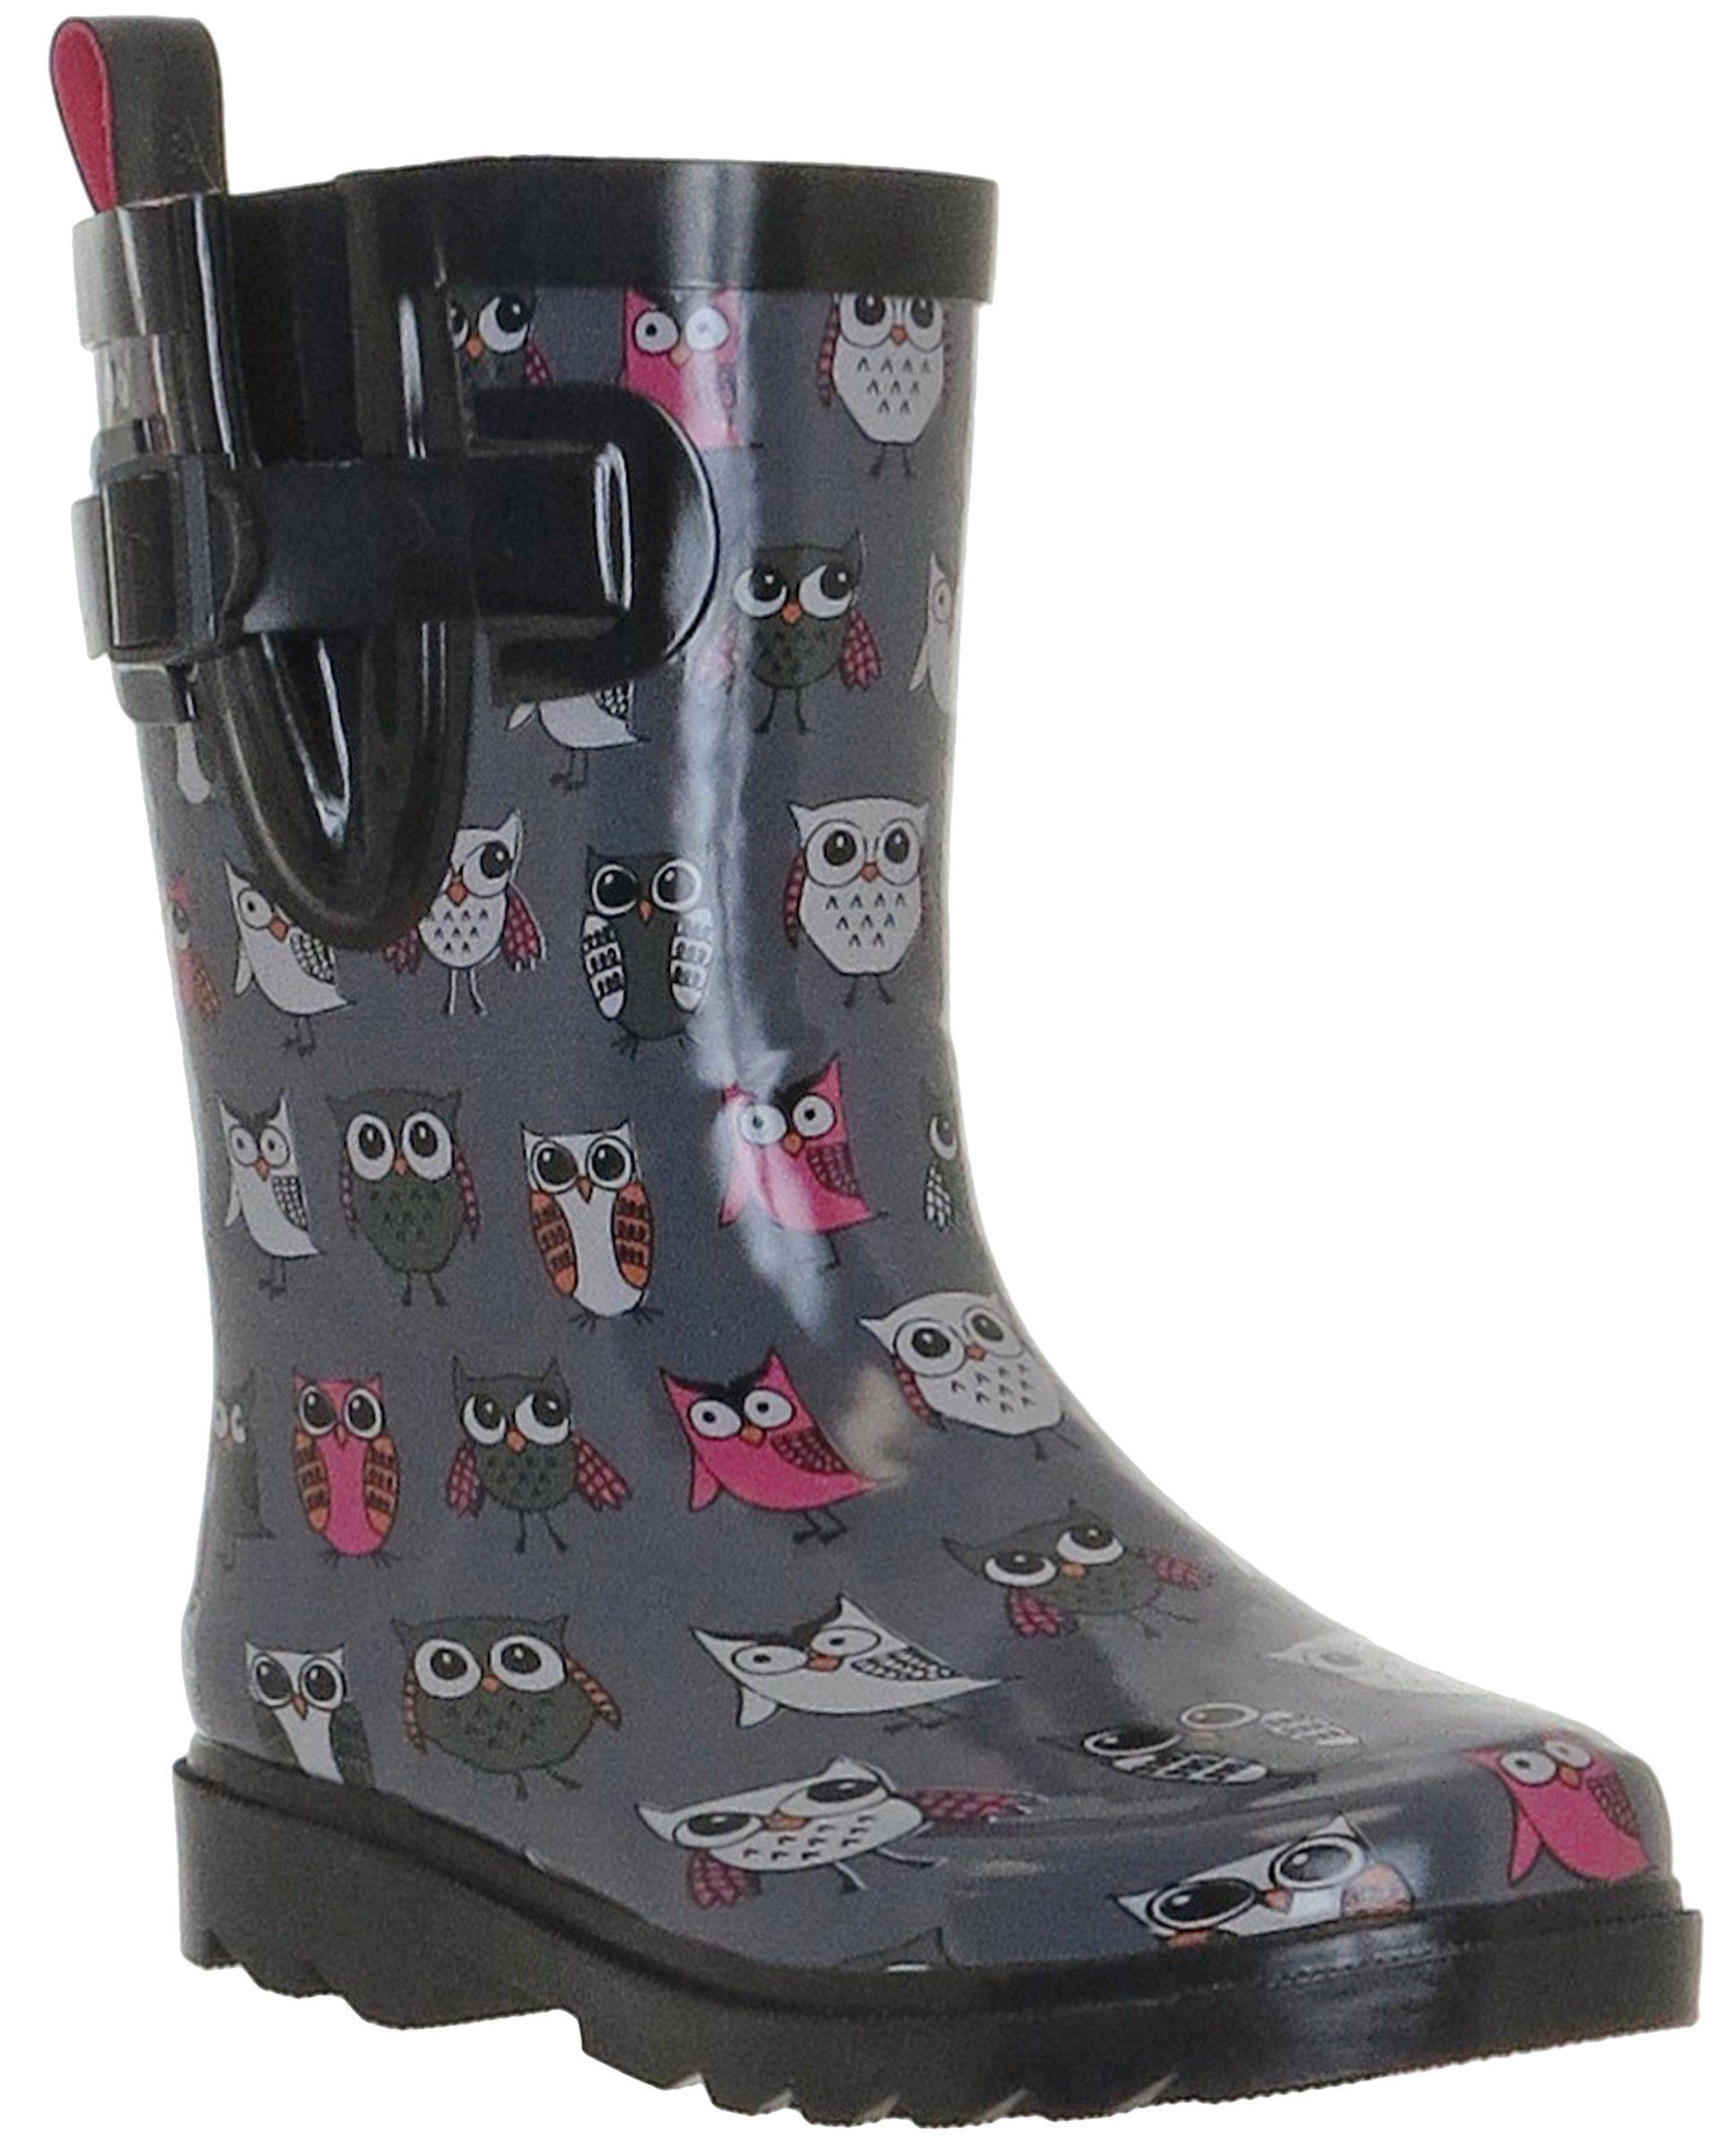 66656b80ec4 Capelli New York Sketchy Pop Owl Print Girls Rain Boots Grey Combo 12/13.  Sketchy Pop. Owl Print. Back Pull. Sporty Body. Girls Rain Boots.